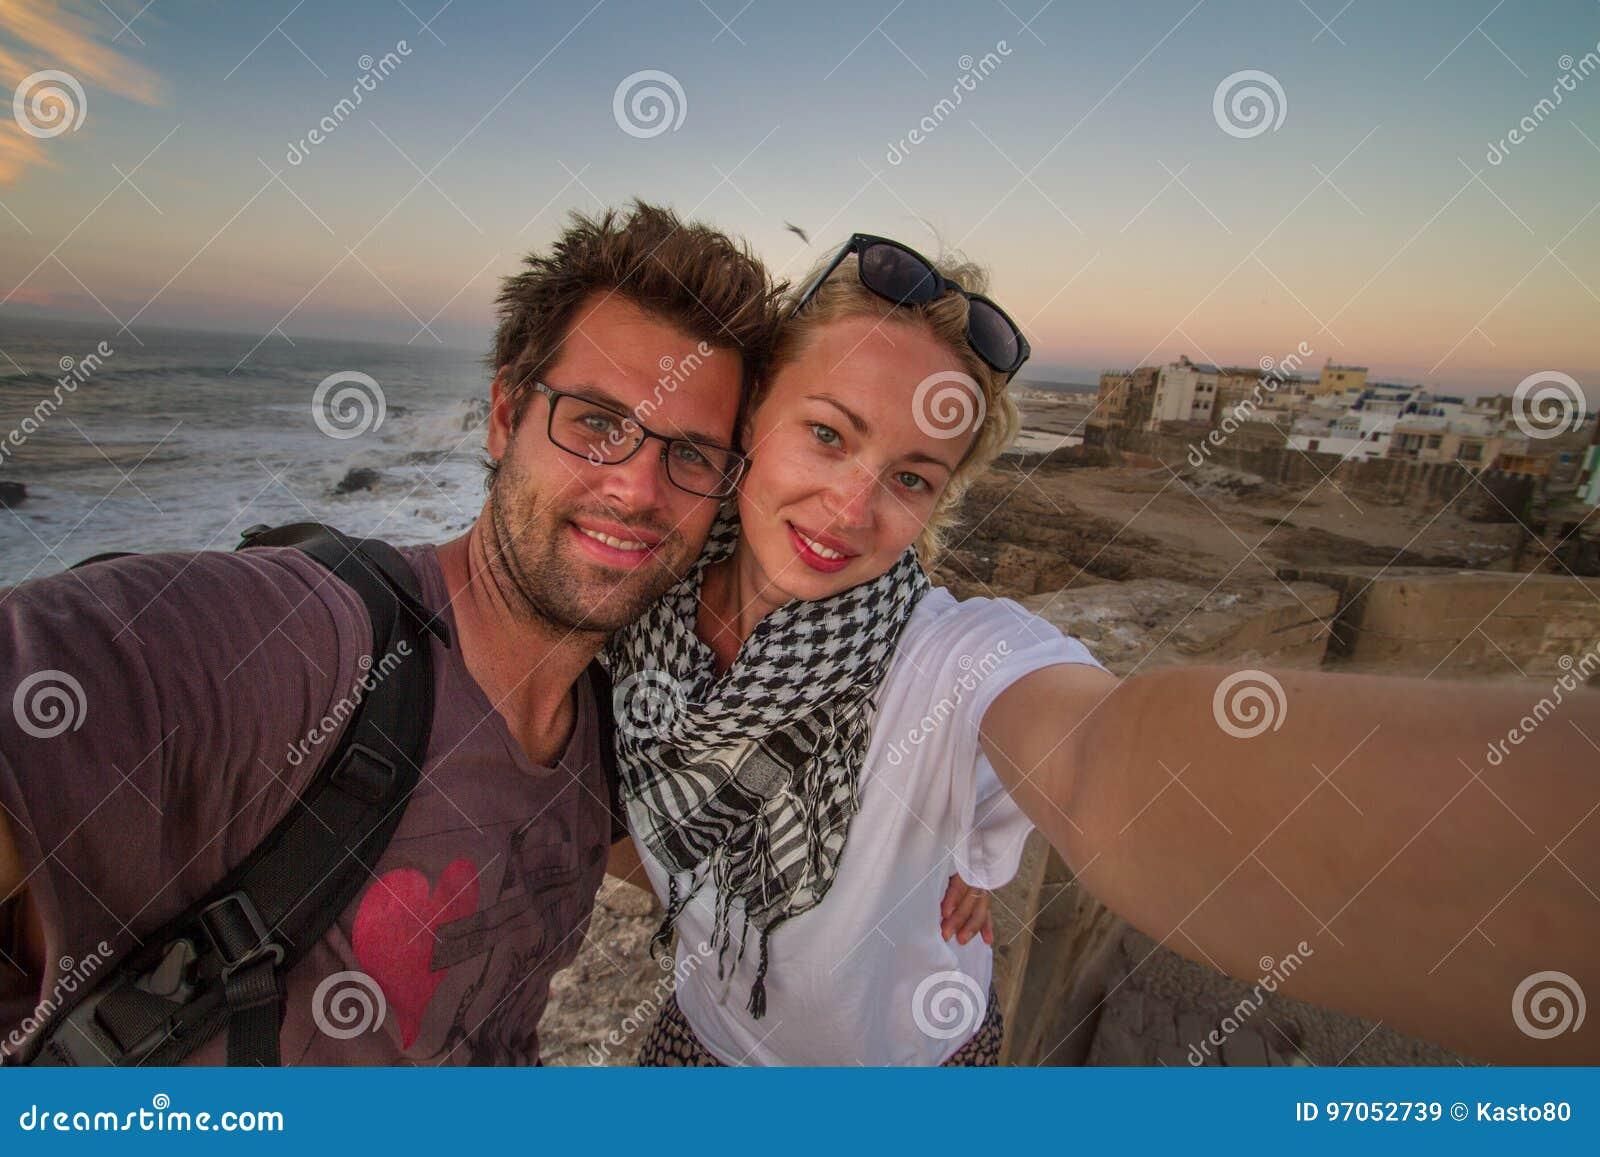 Dating Girl Essaouira.